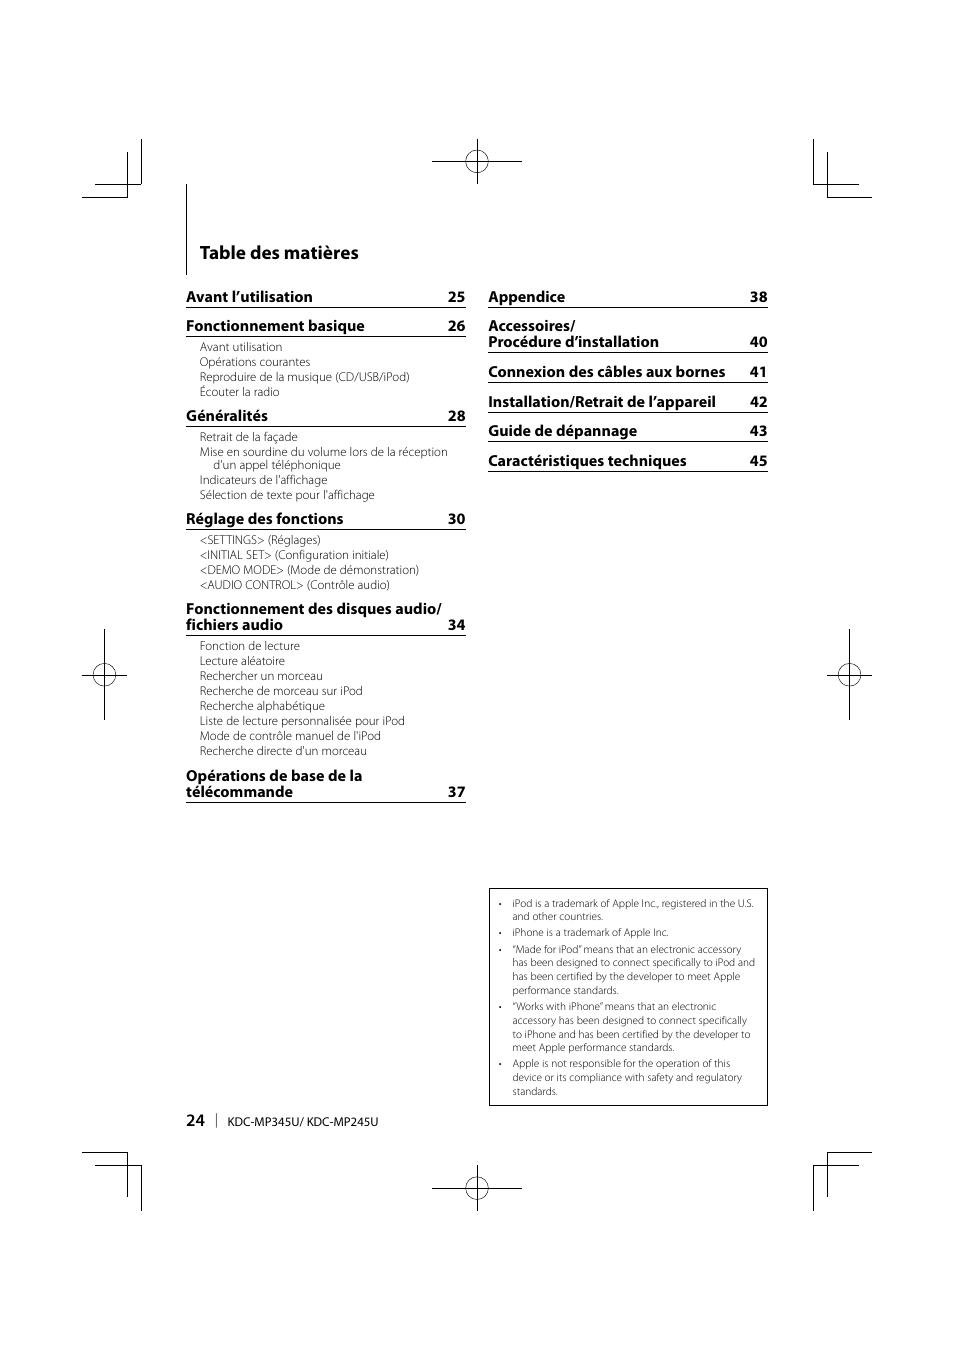 Kenwood KDC-MP345U User Manual | Page 24 / 68